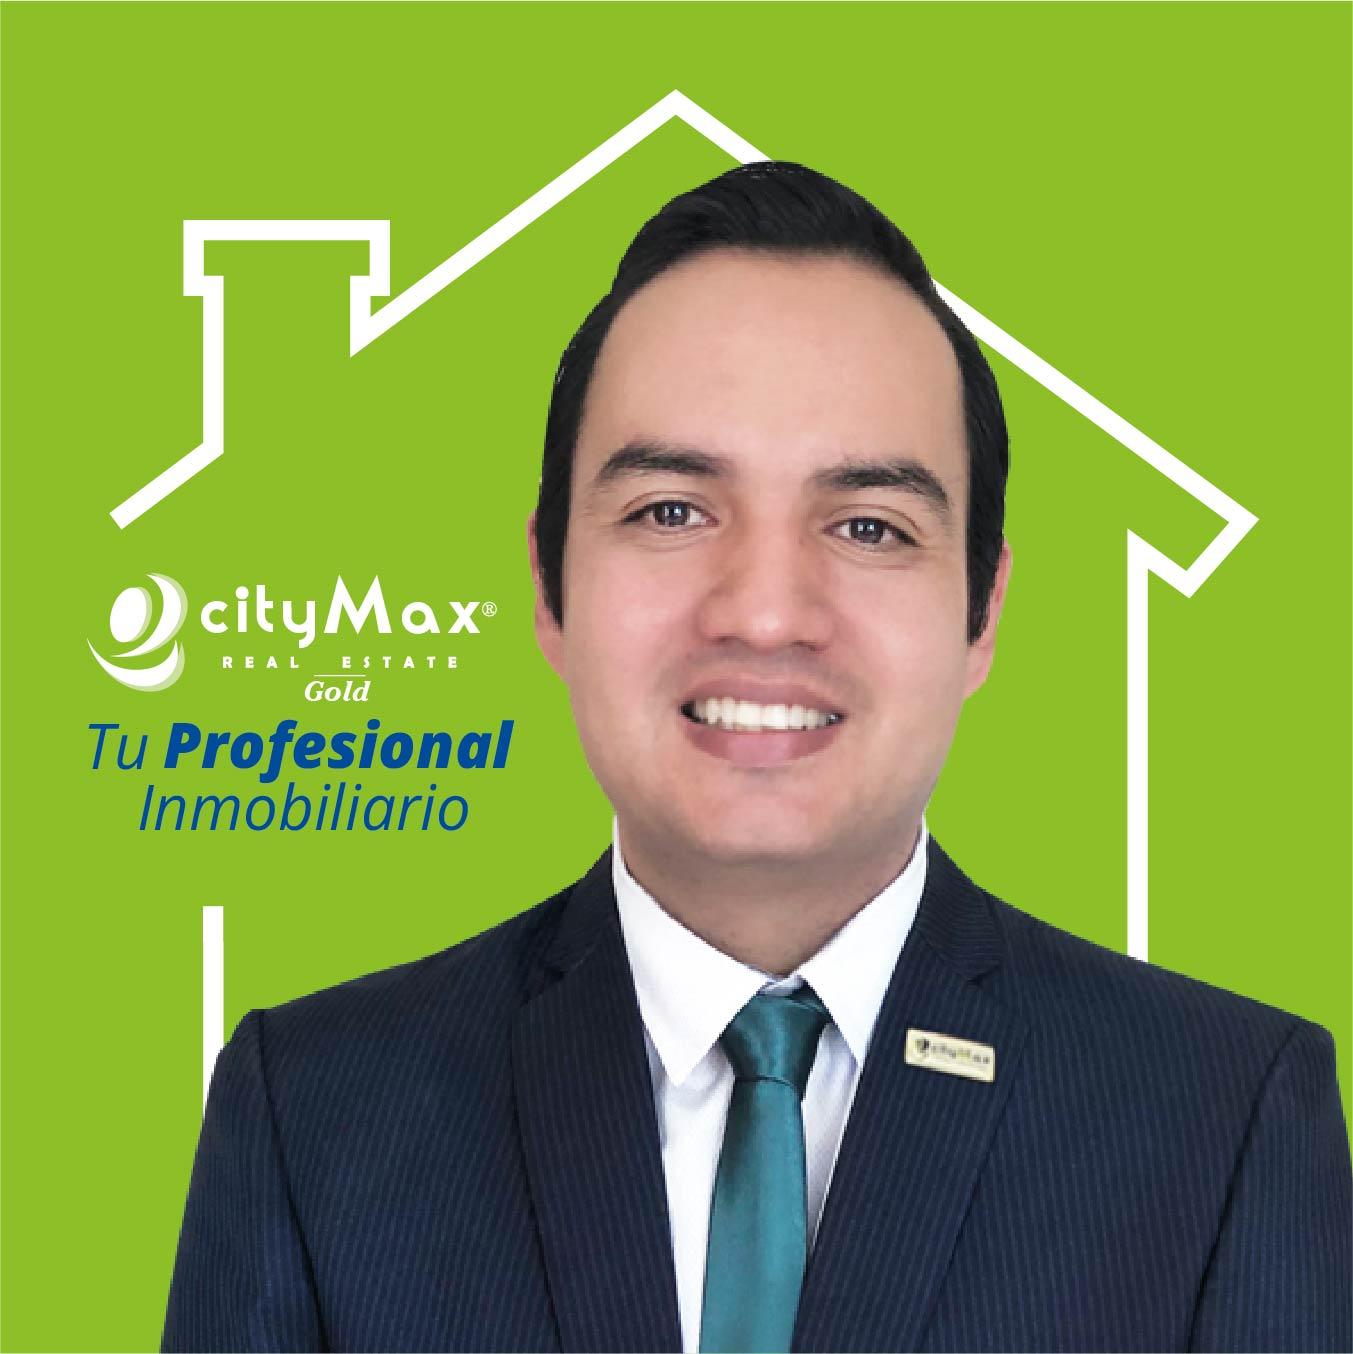 Francisco Estrada